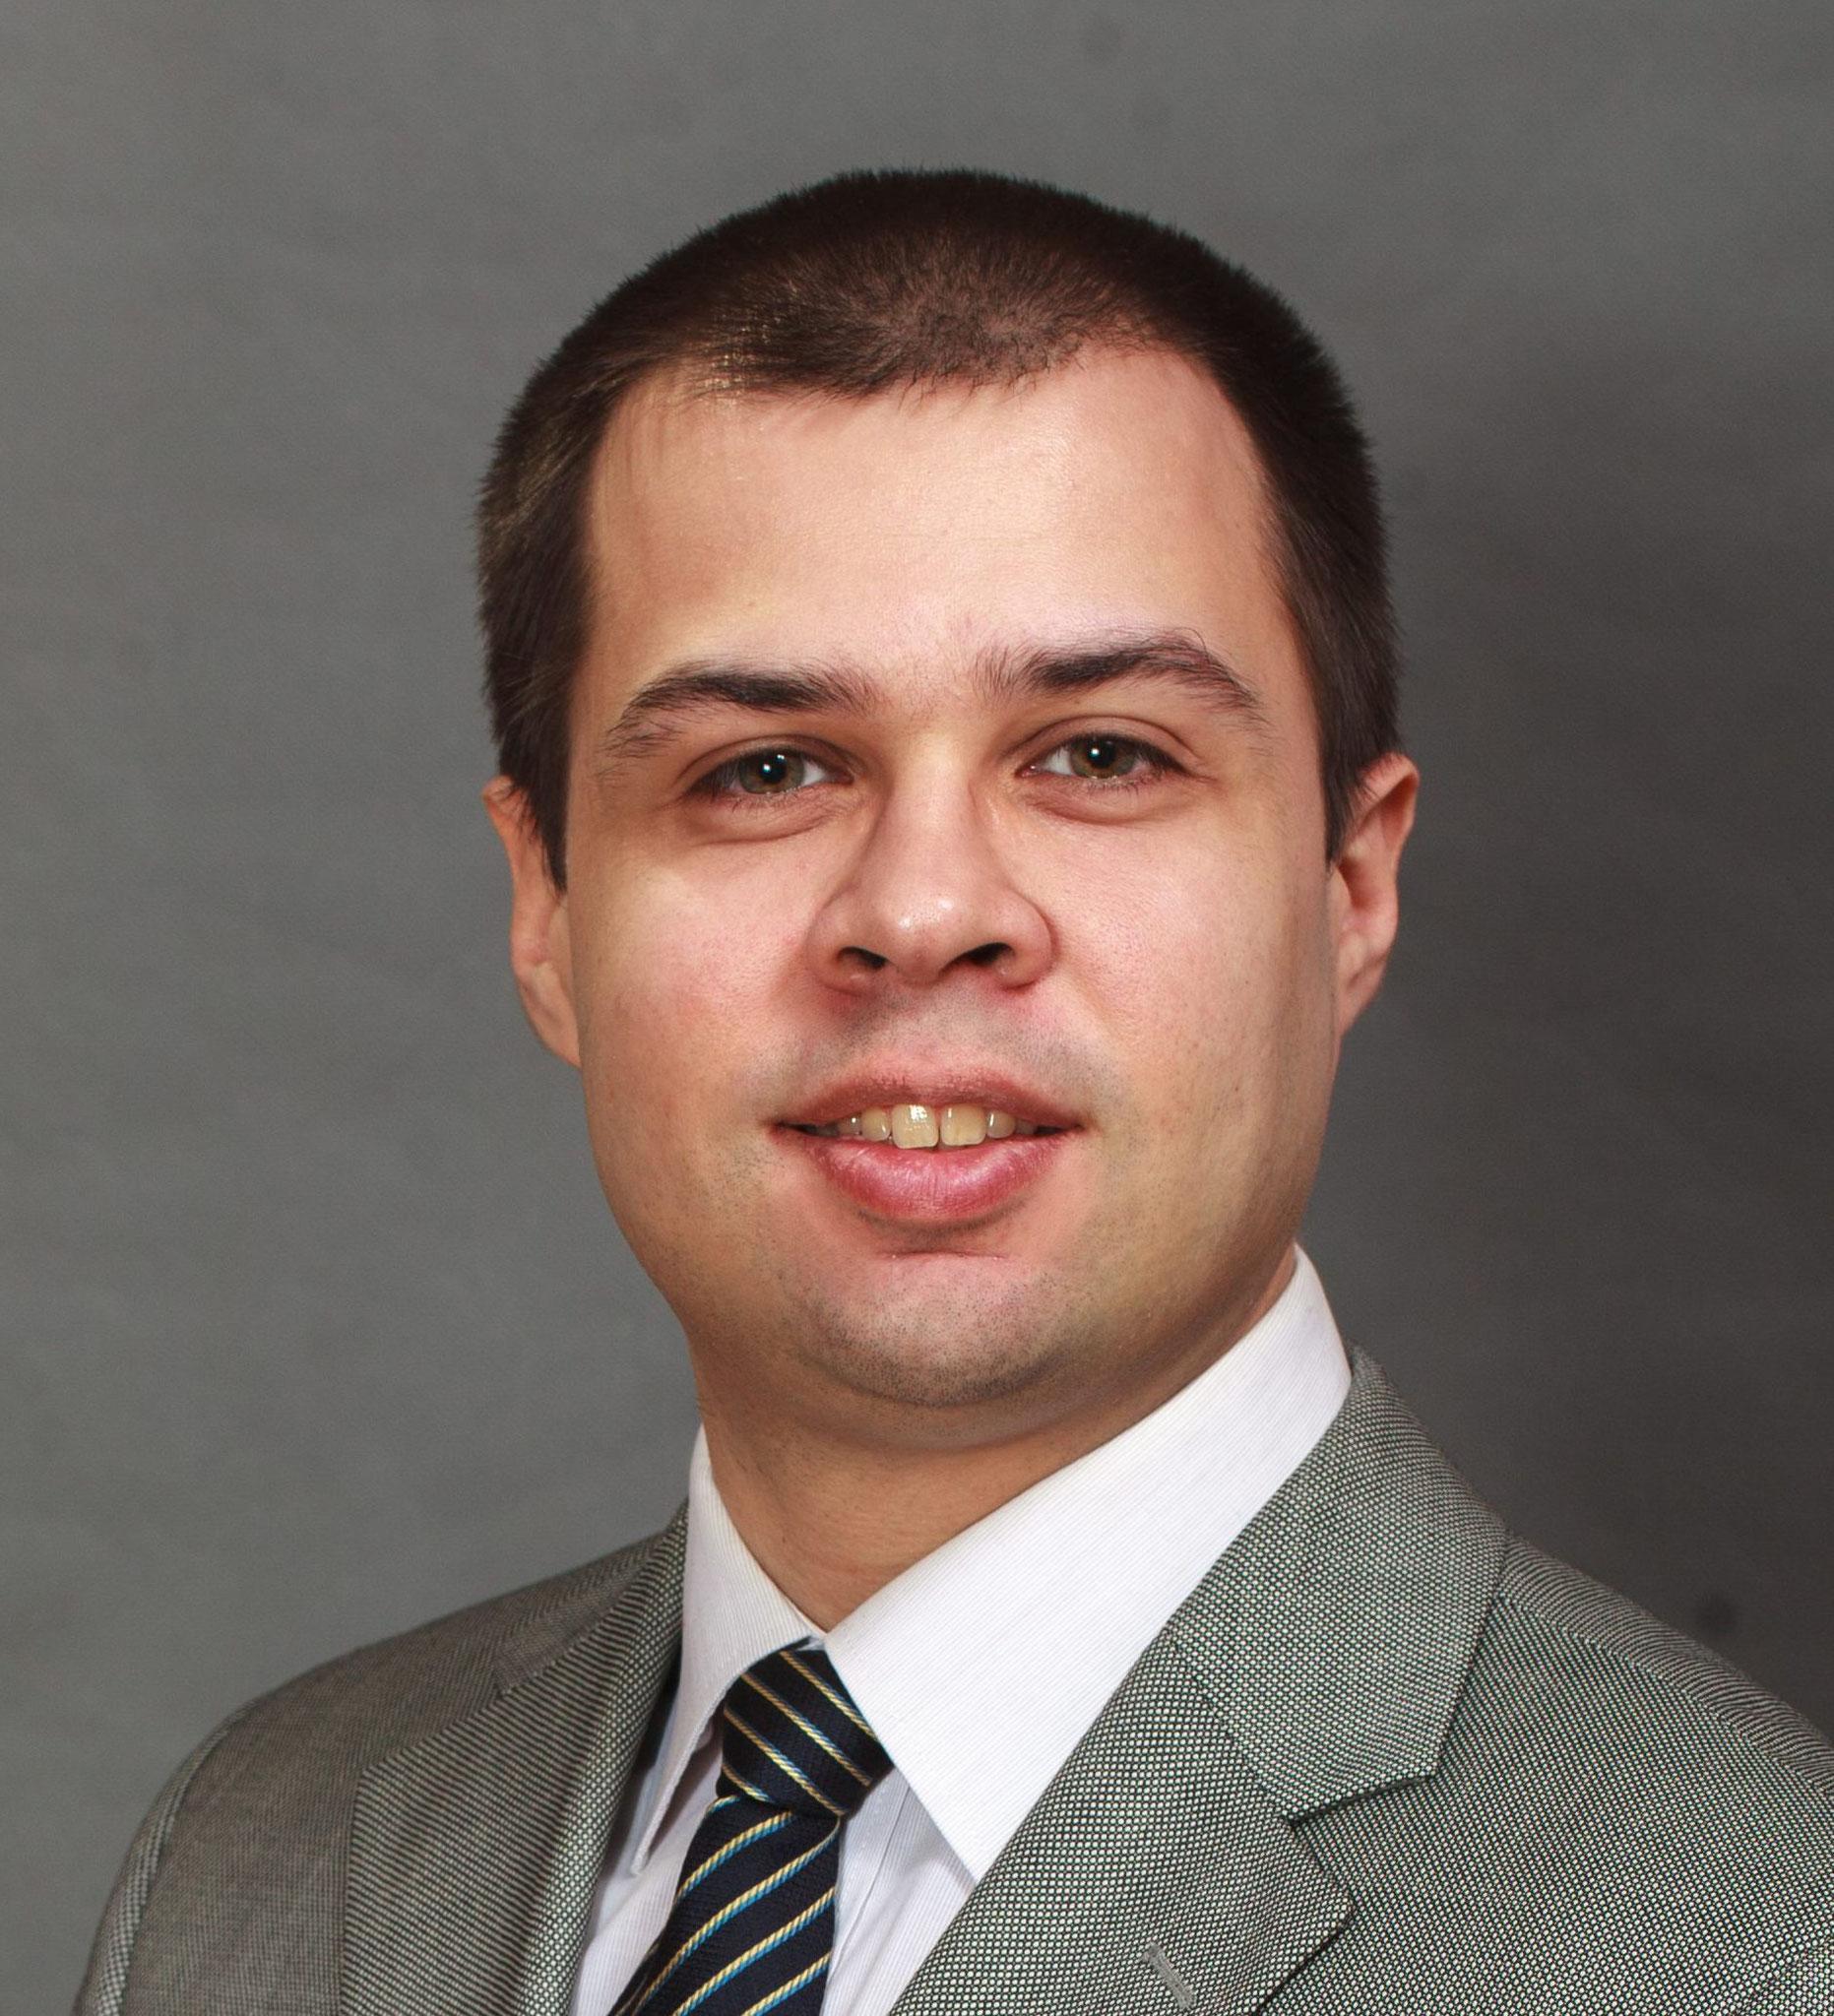 Дмитрий Михайлович ВОДОЛАЗОВ